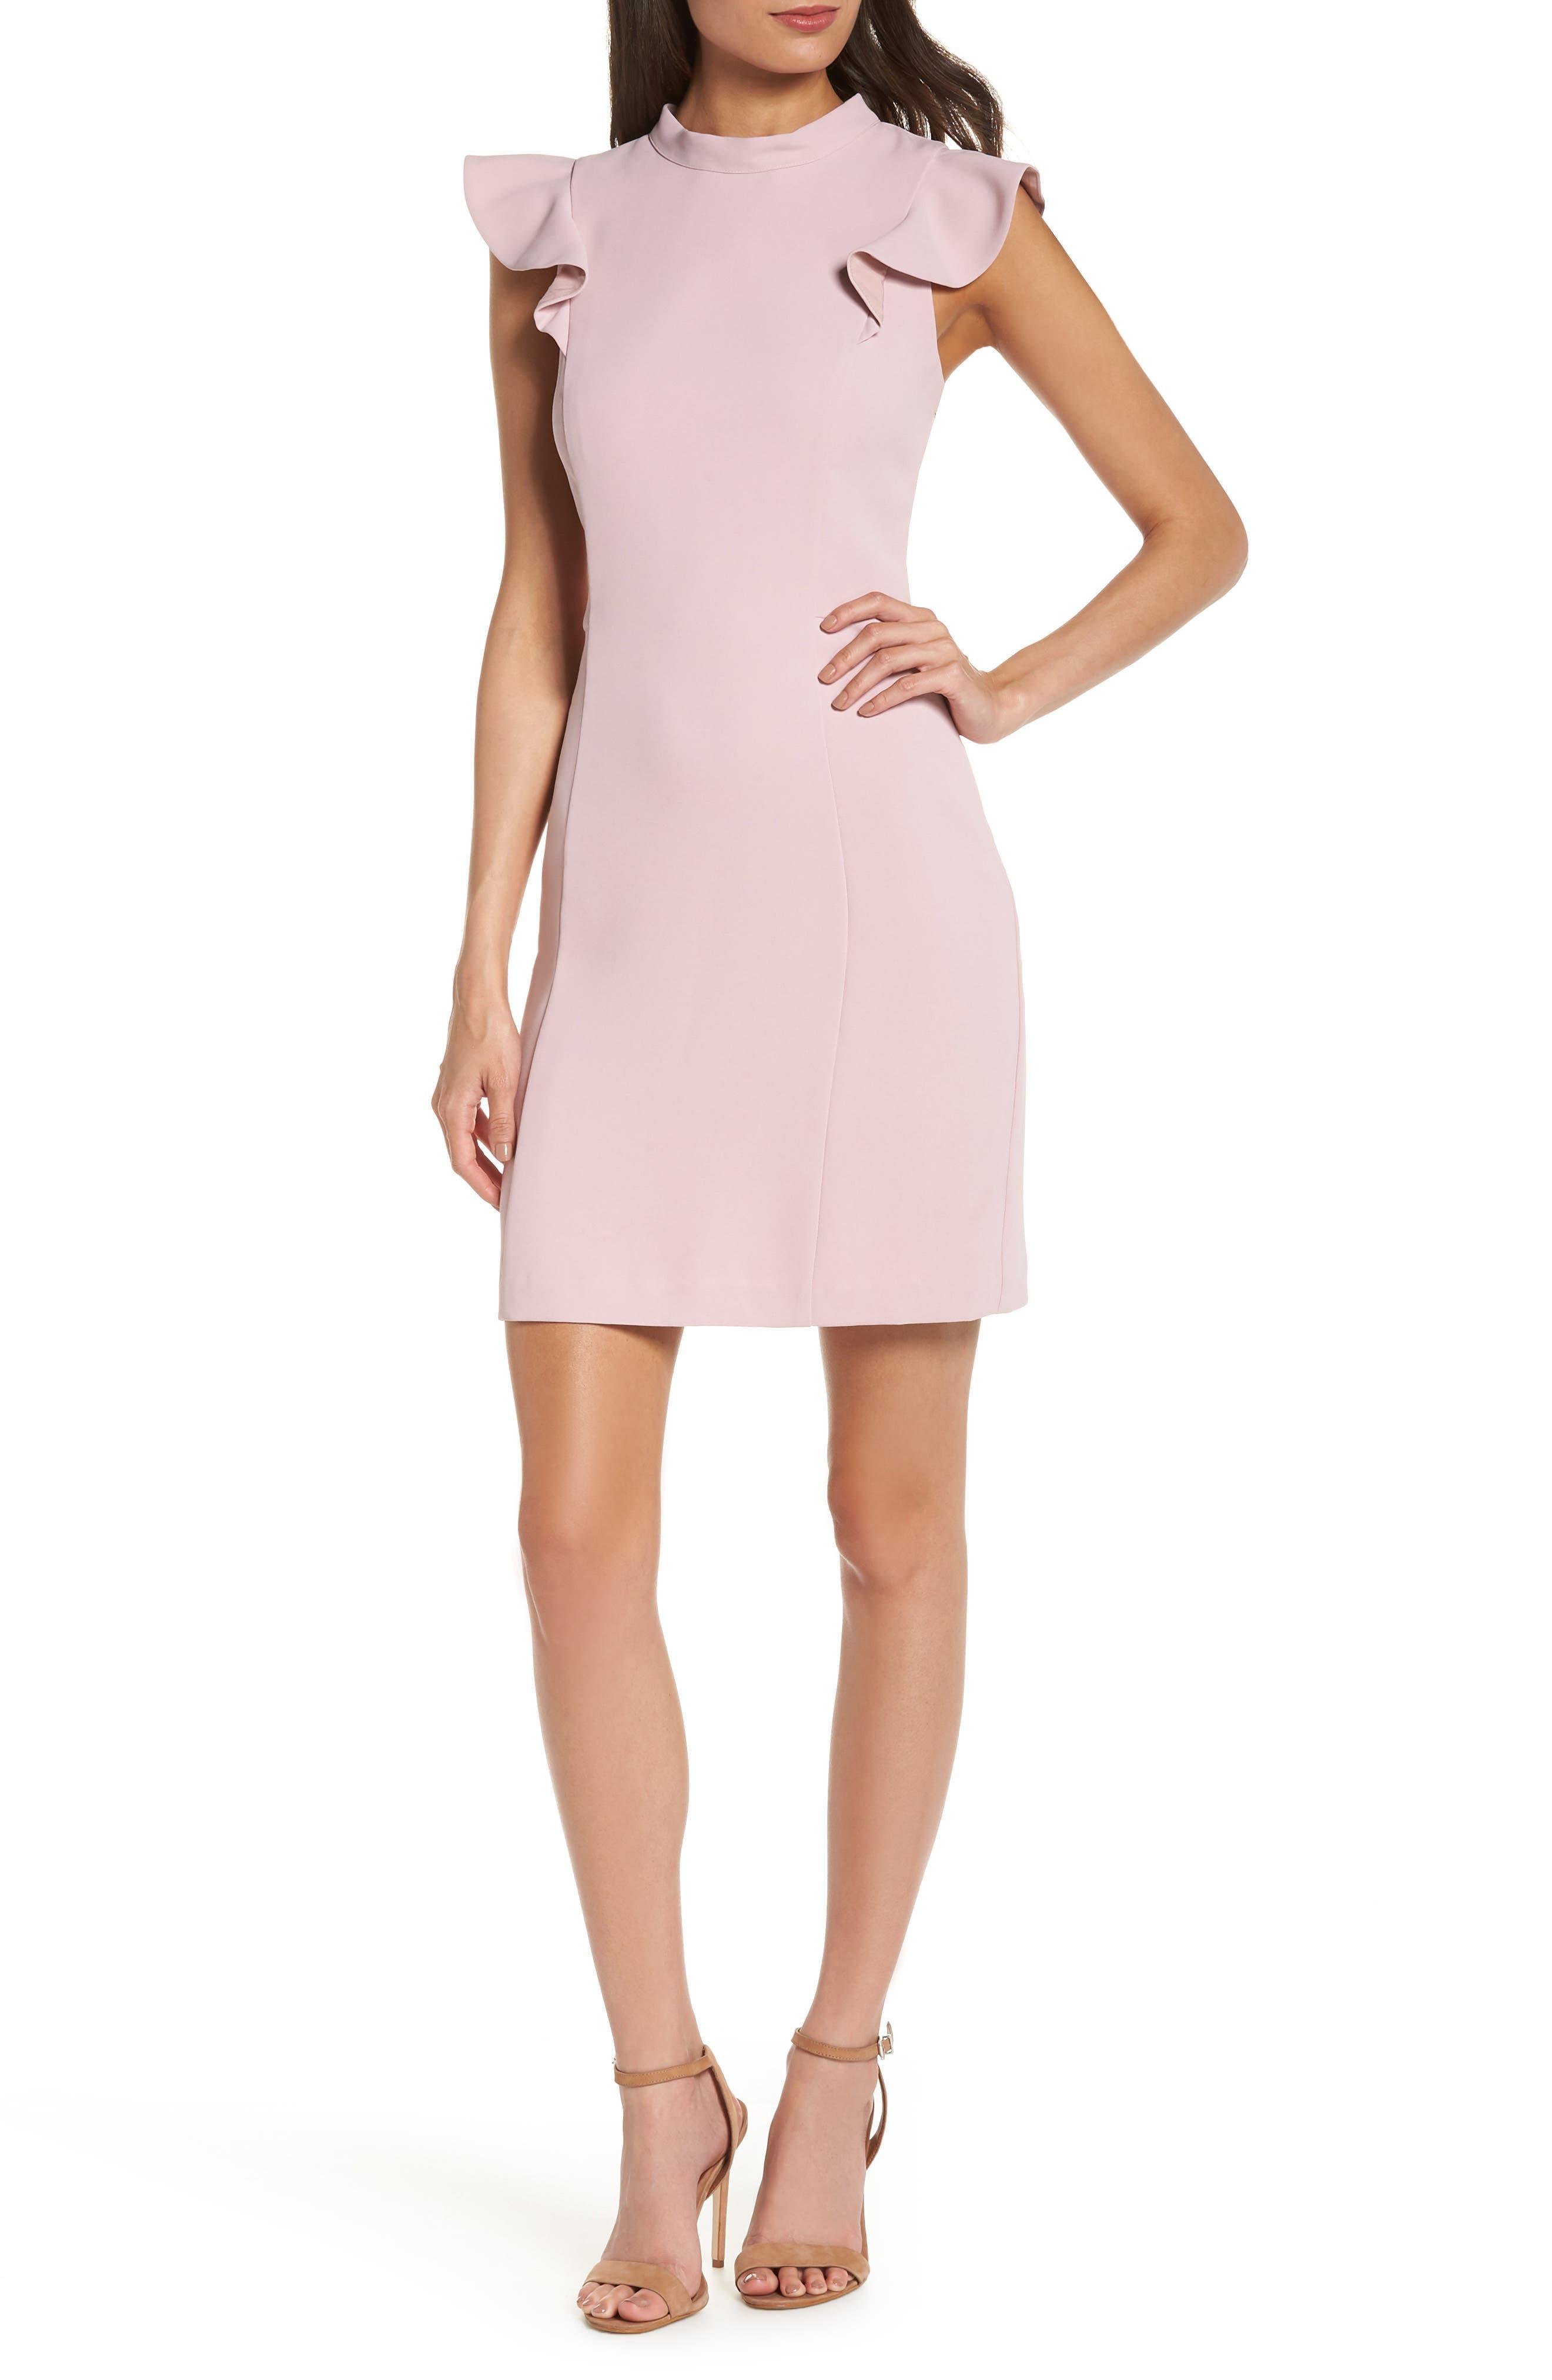 ADELYN RAE Ina Ruffle Dress, Lilac